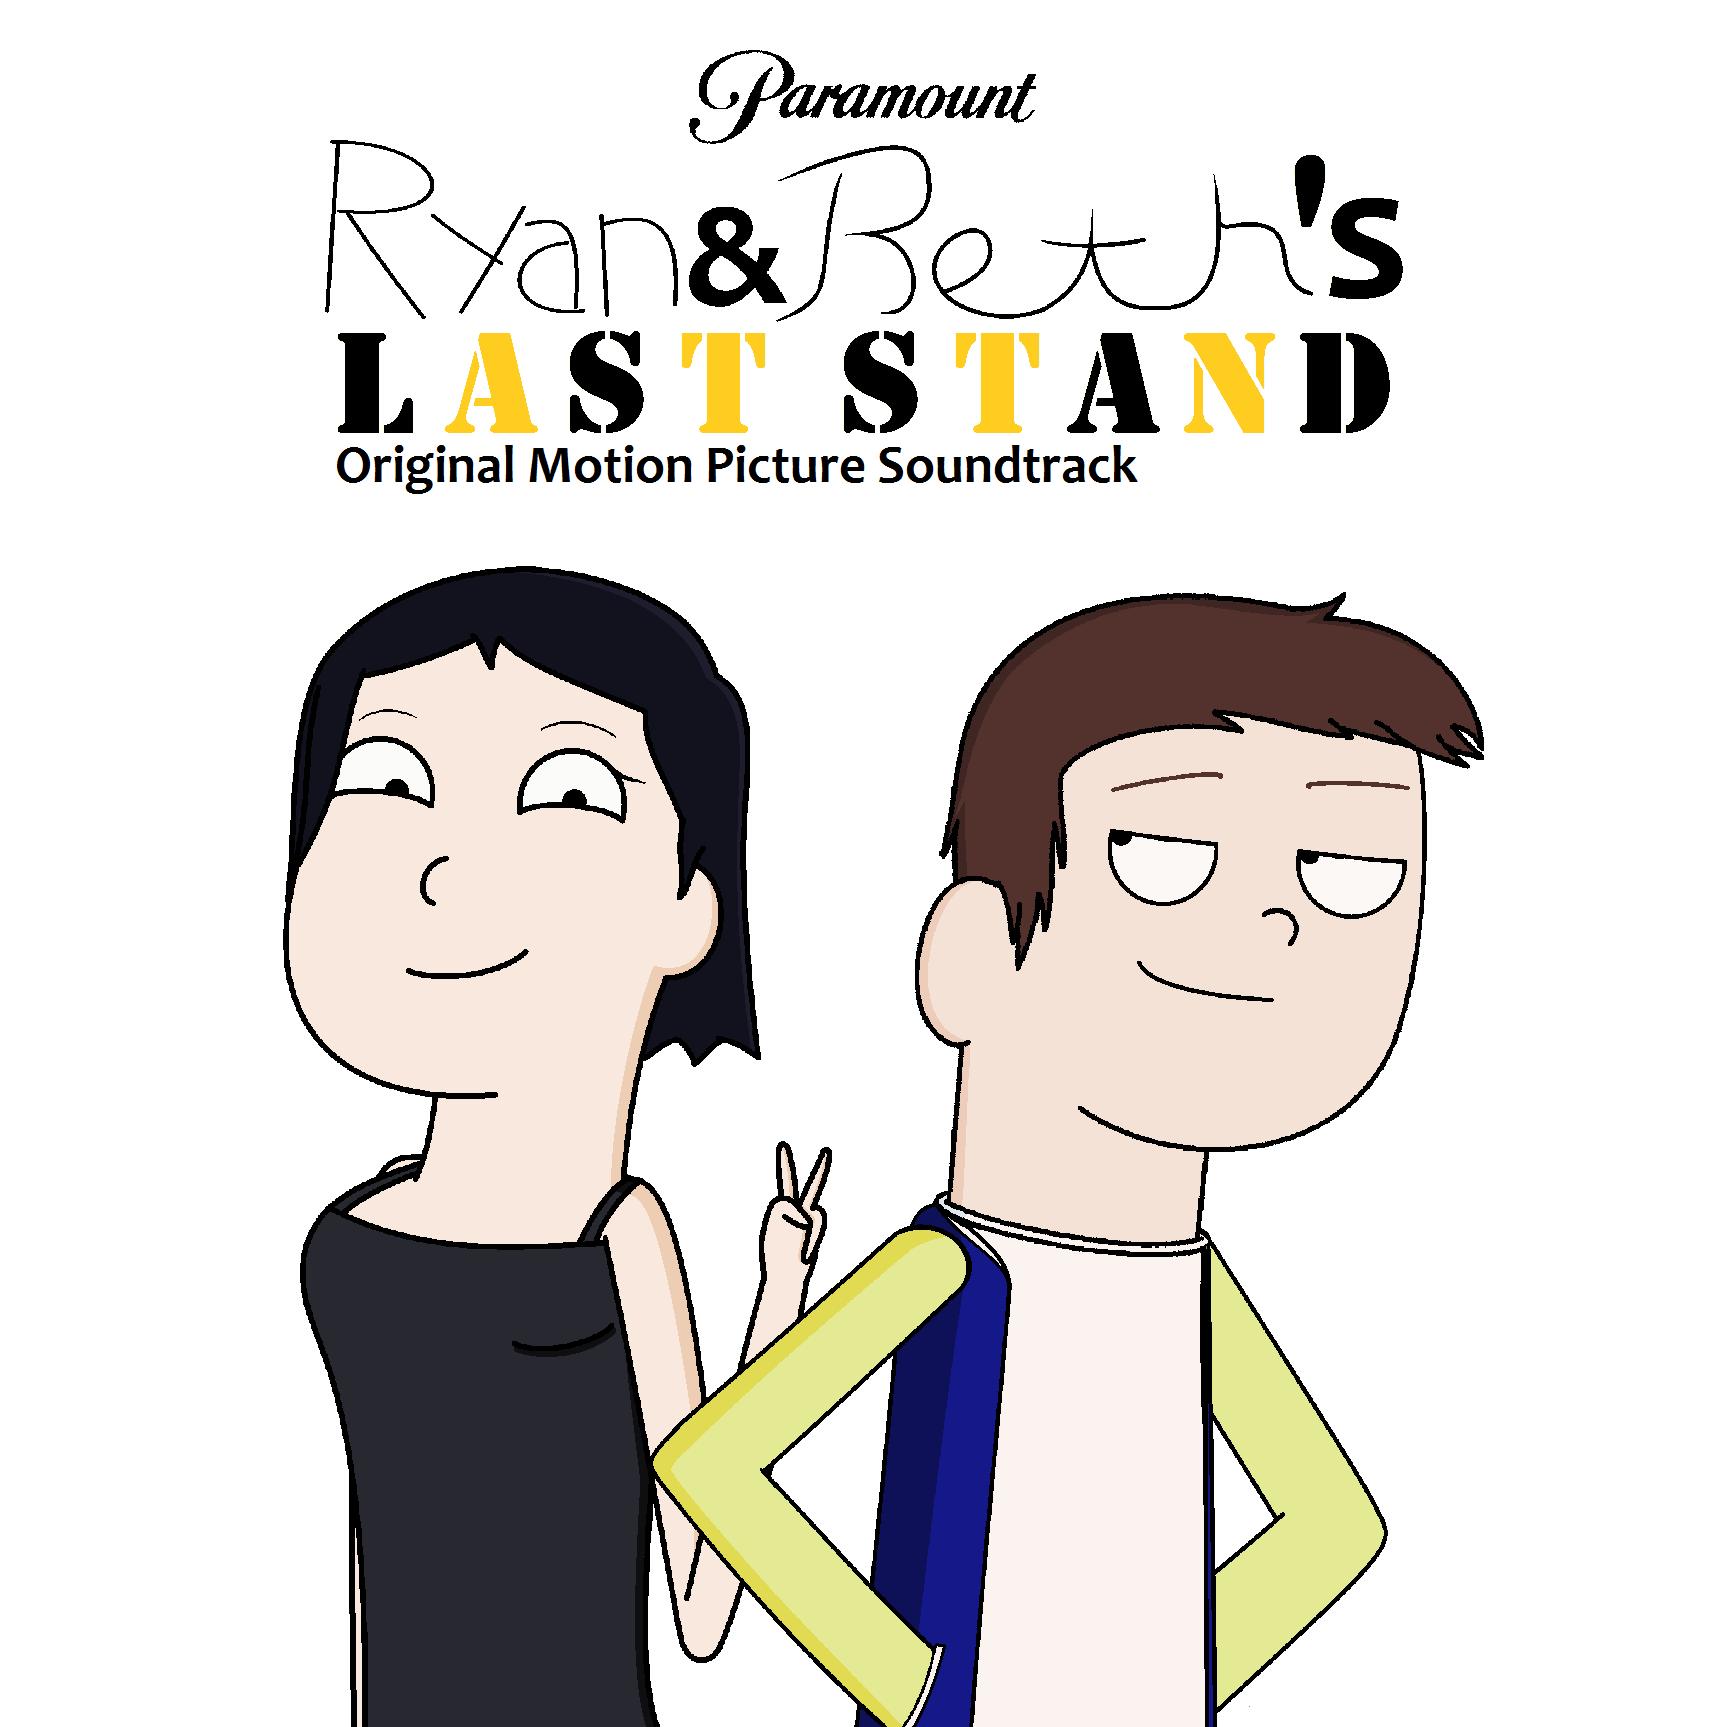 Ryan & Beth's Last Stand